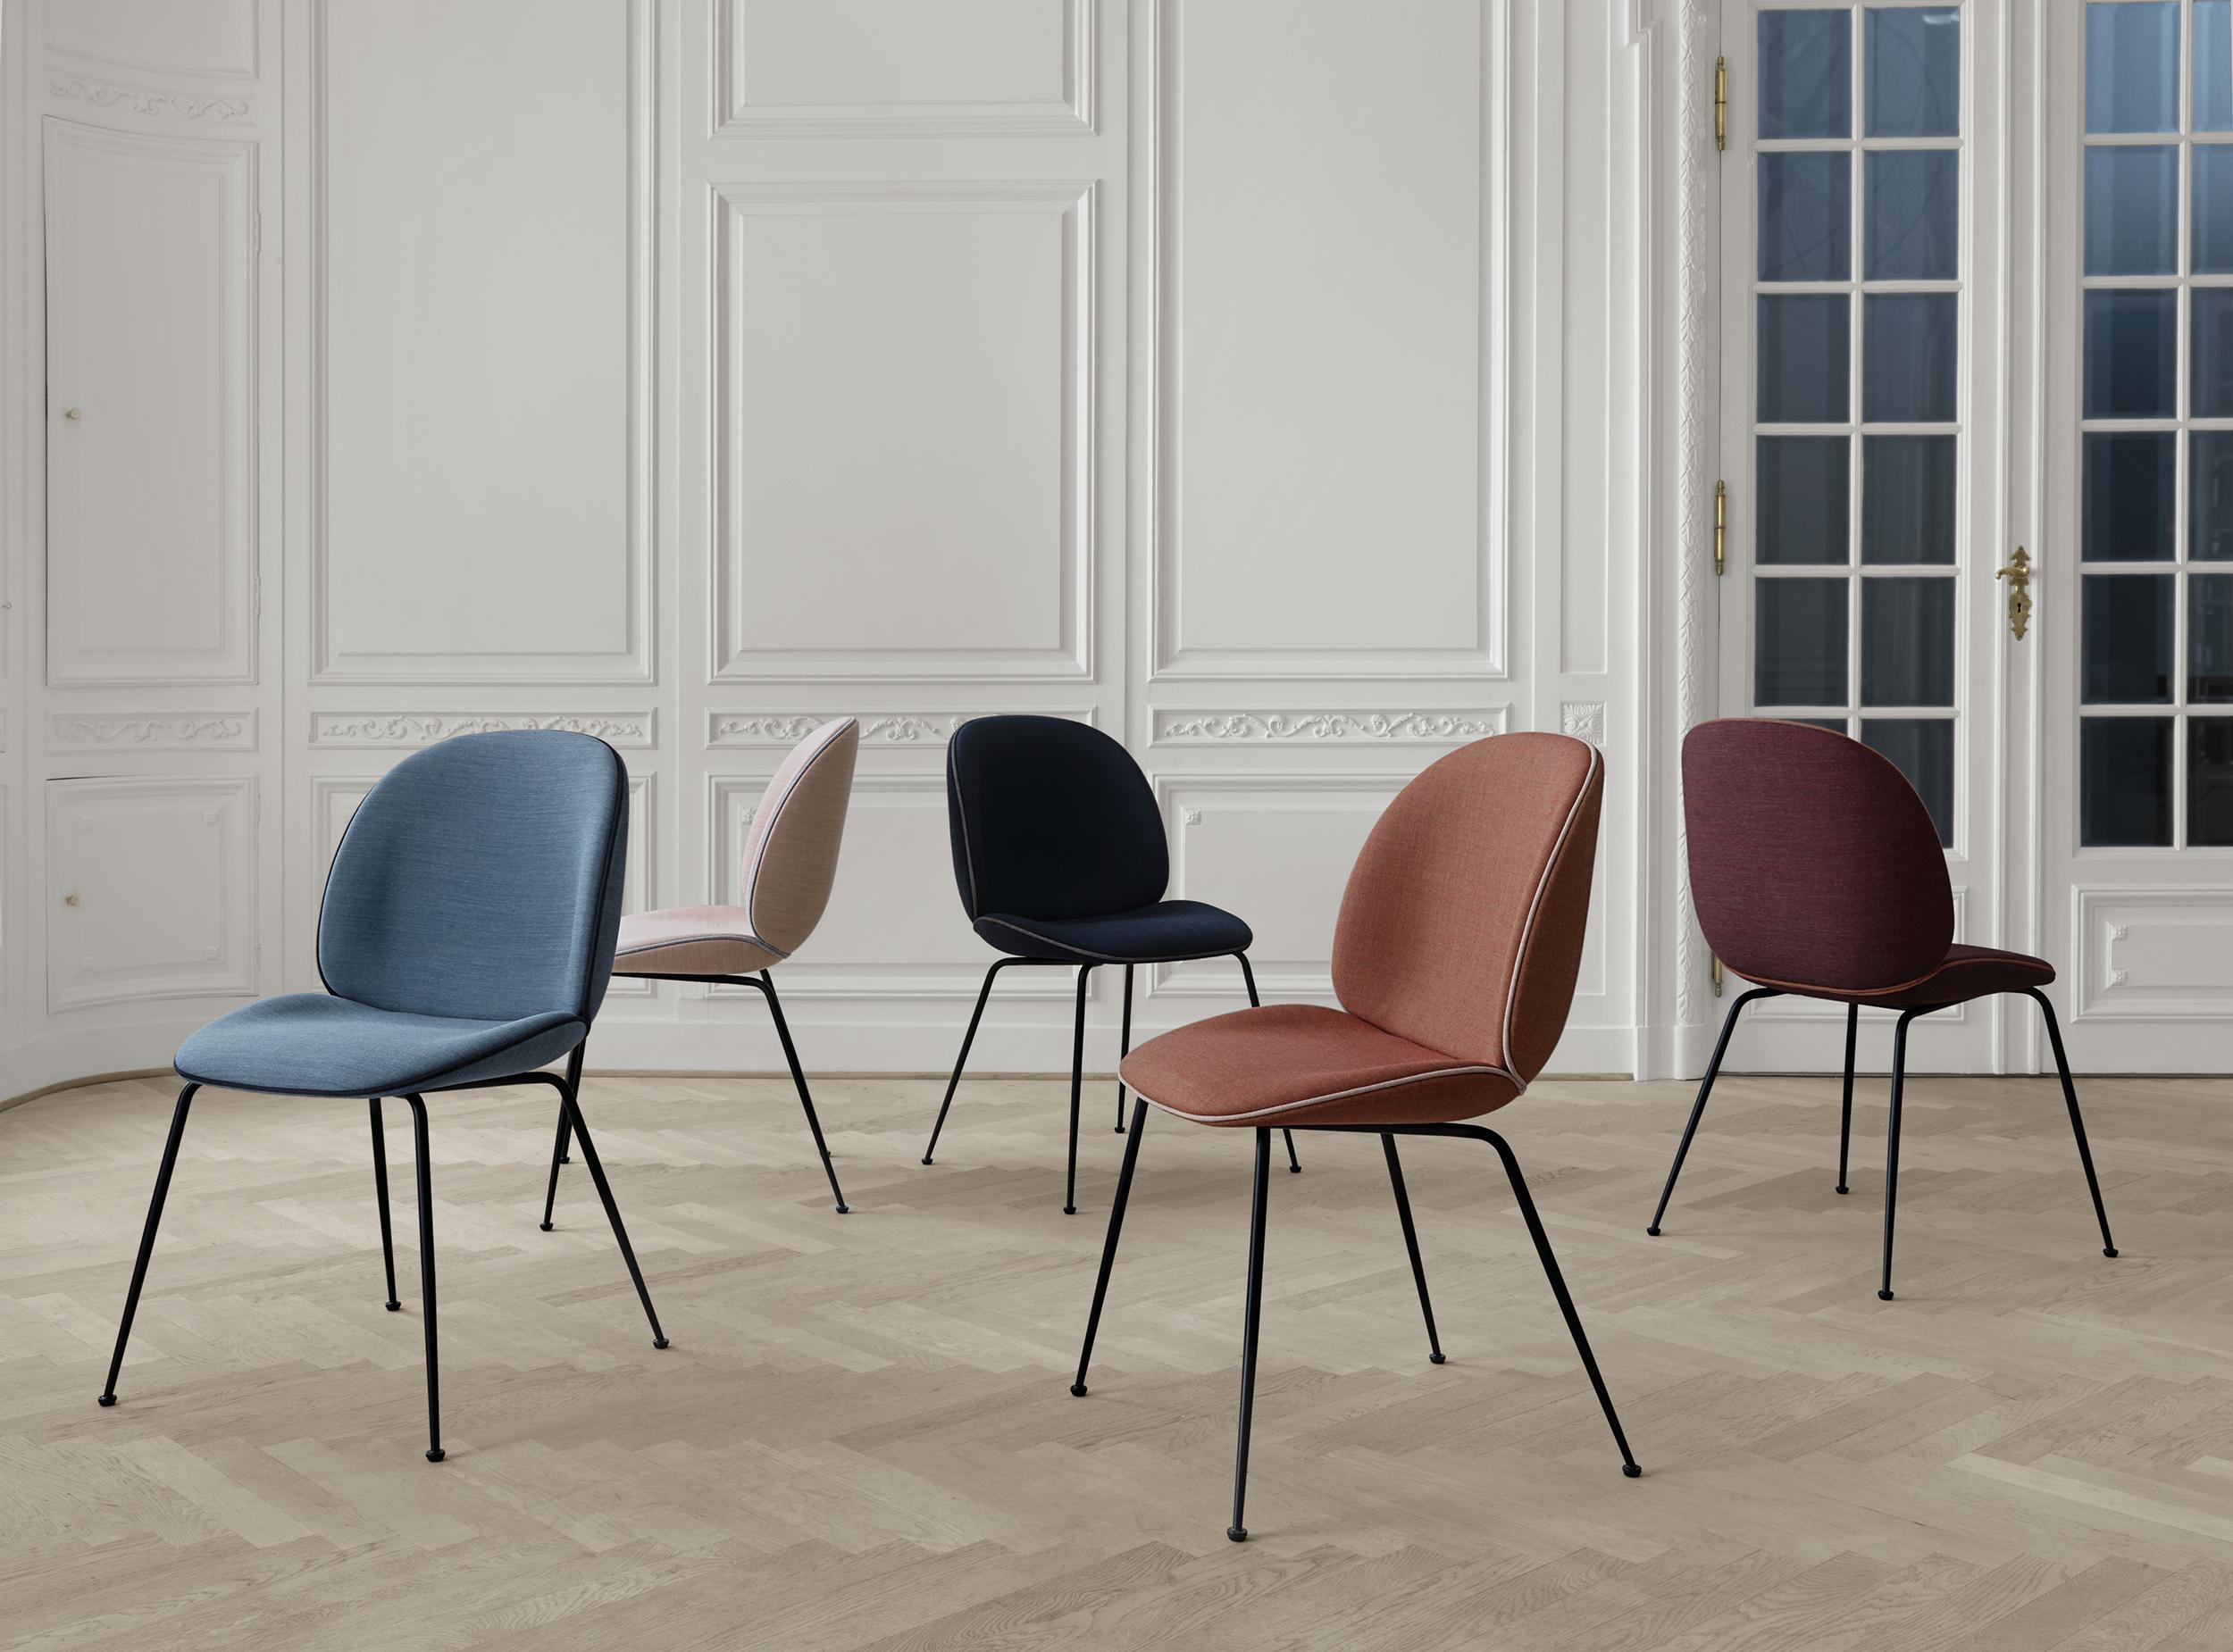 Name : Beetle dining chair / Designer :GamFratesi, 2013